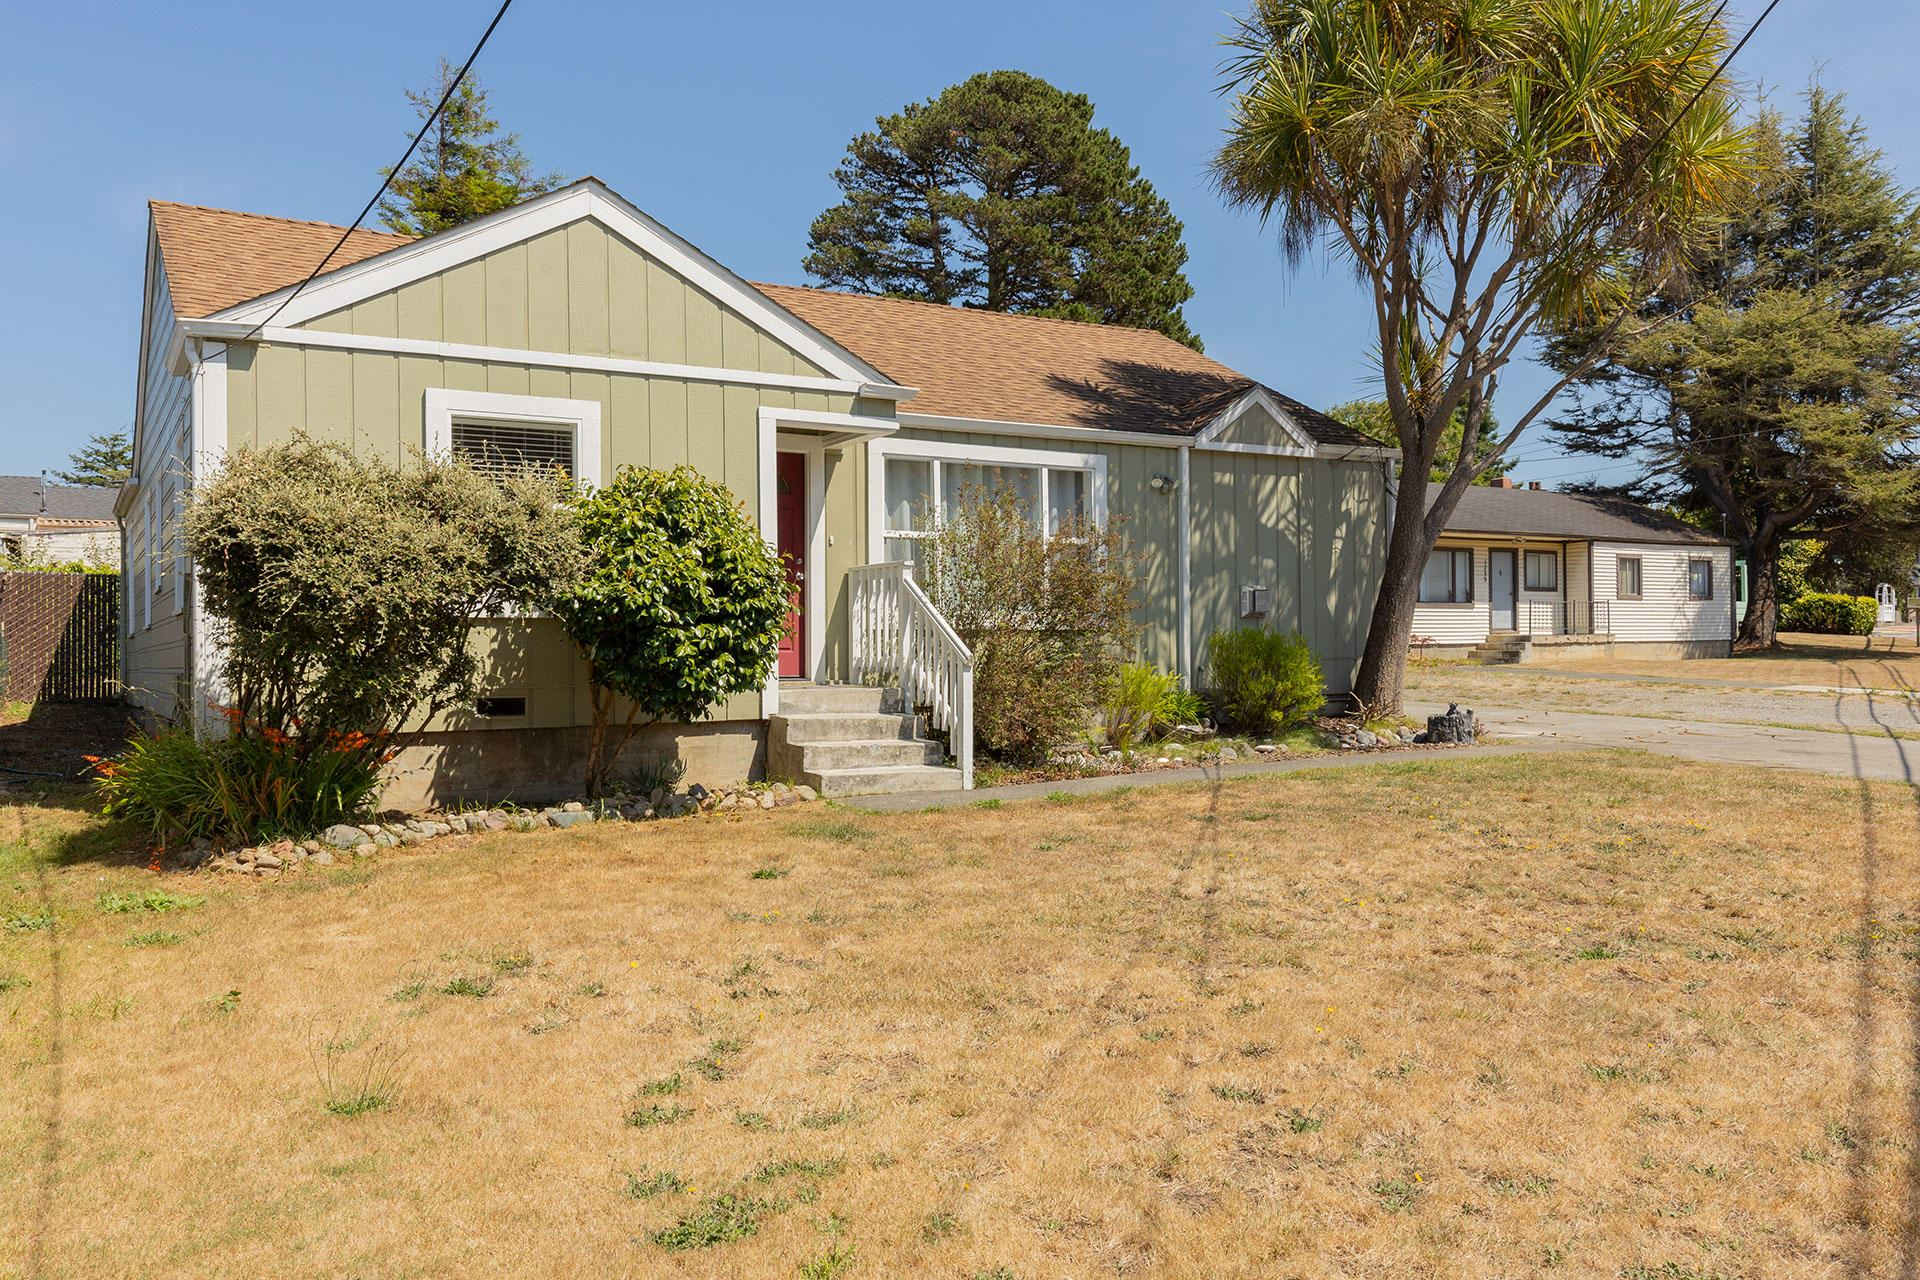 1729 Myrtle Avenue, Myrtletown, CA 95501 - MLS#: 259701